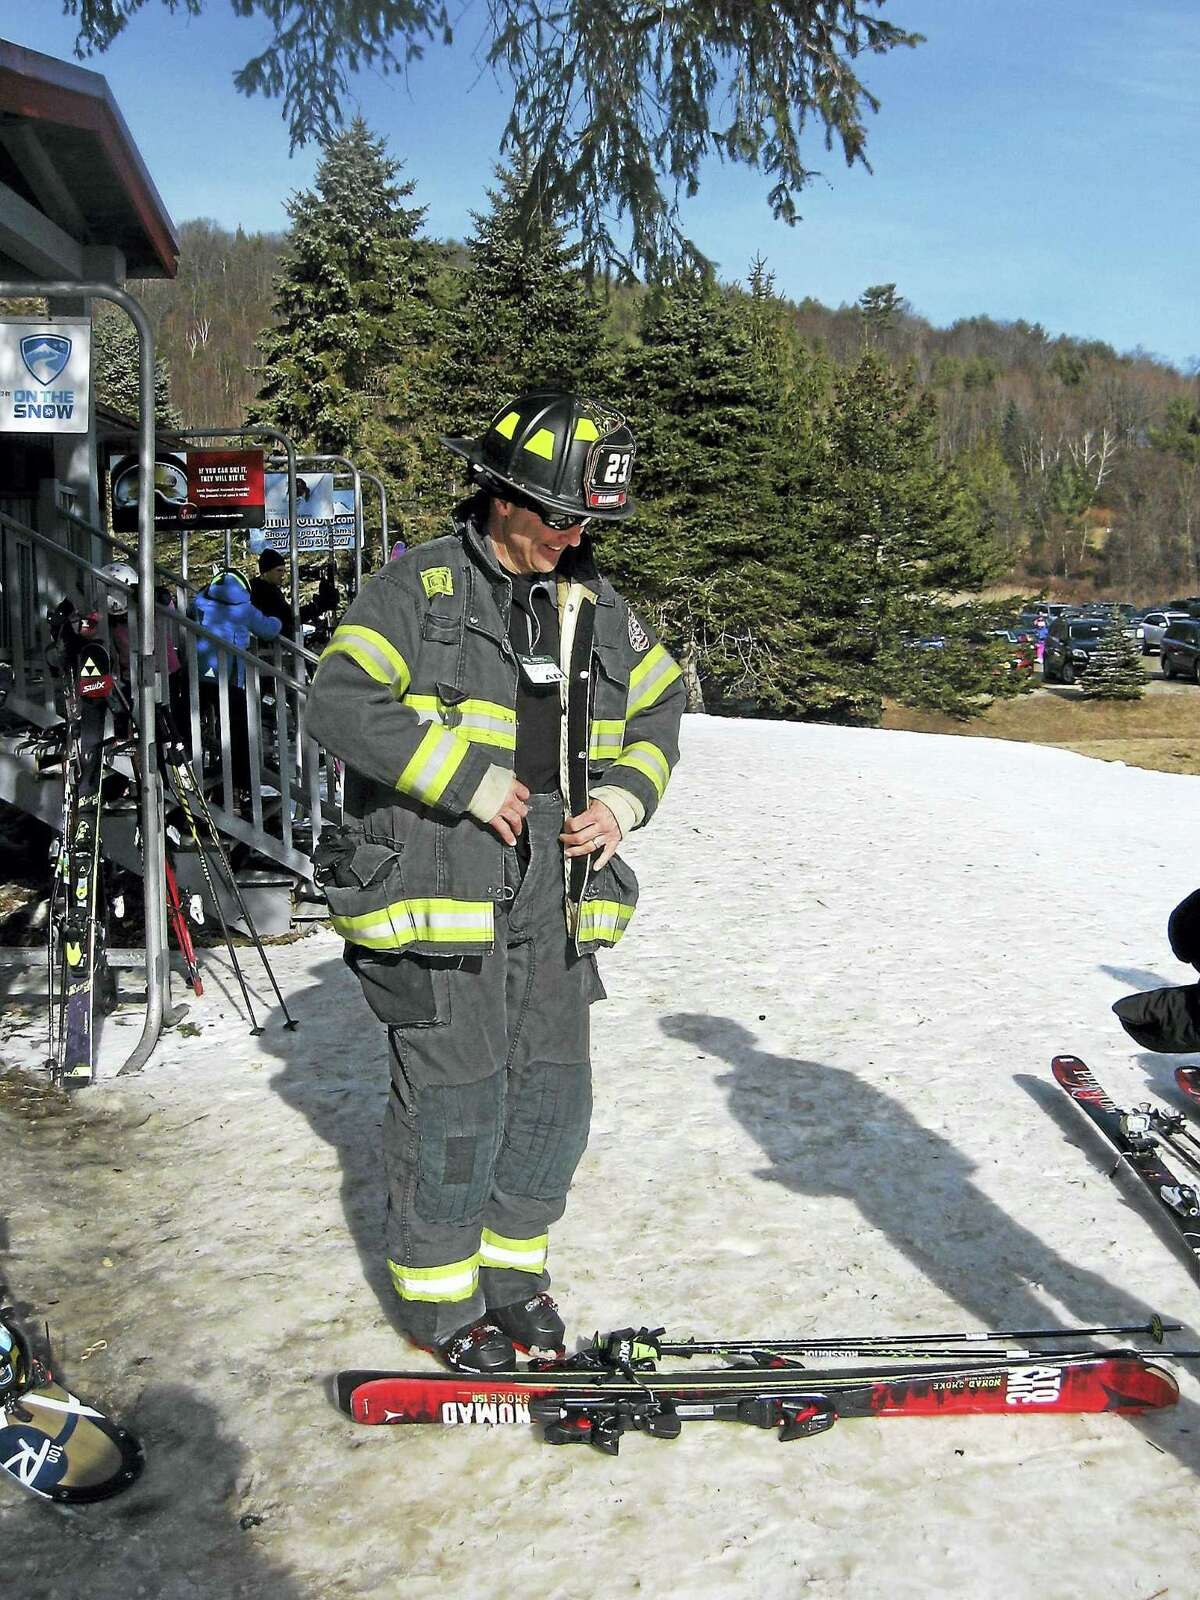 John Torsiello photo Allan Lewis of the winning Danbury Fire Department team gets prepared for Sunday's Mohawk Mountain Firefighter Race.